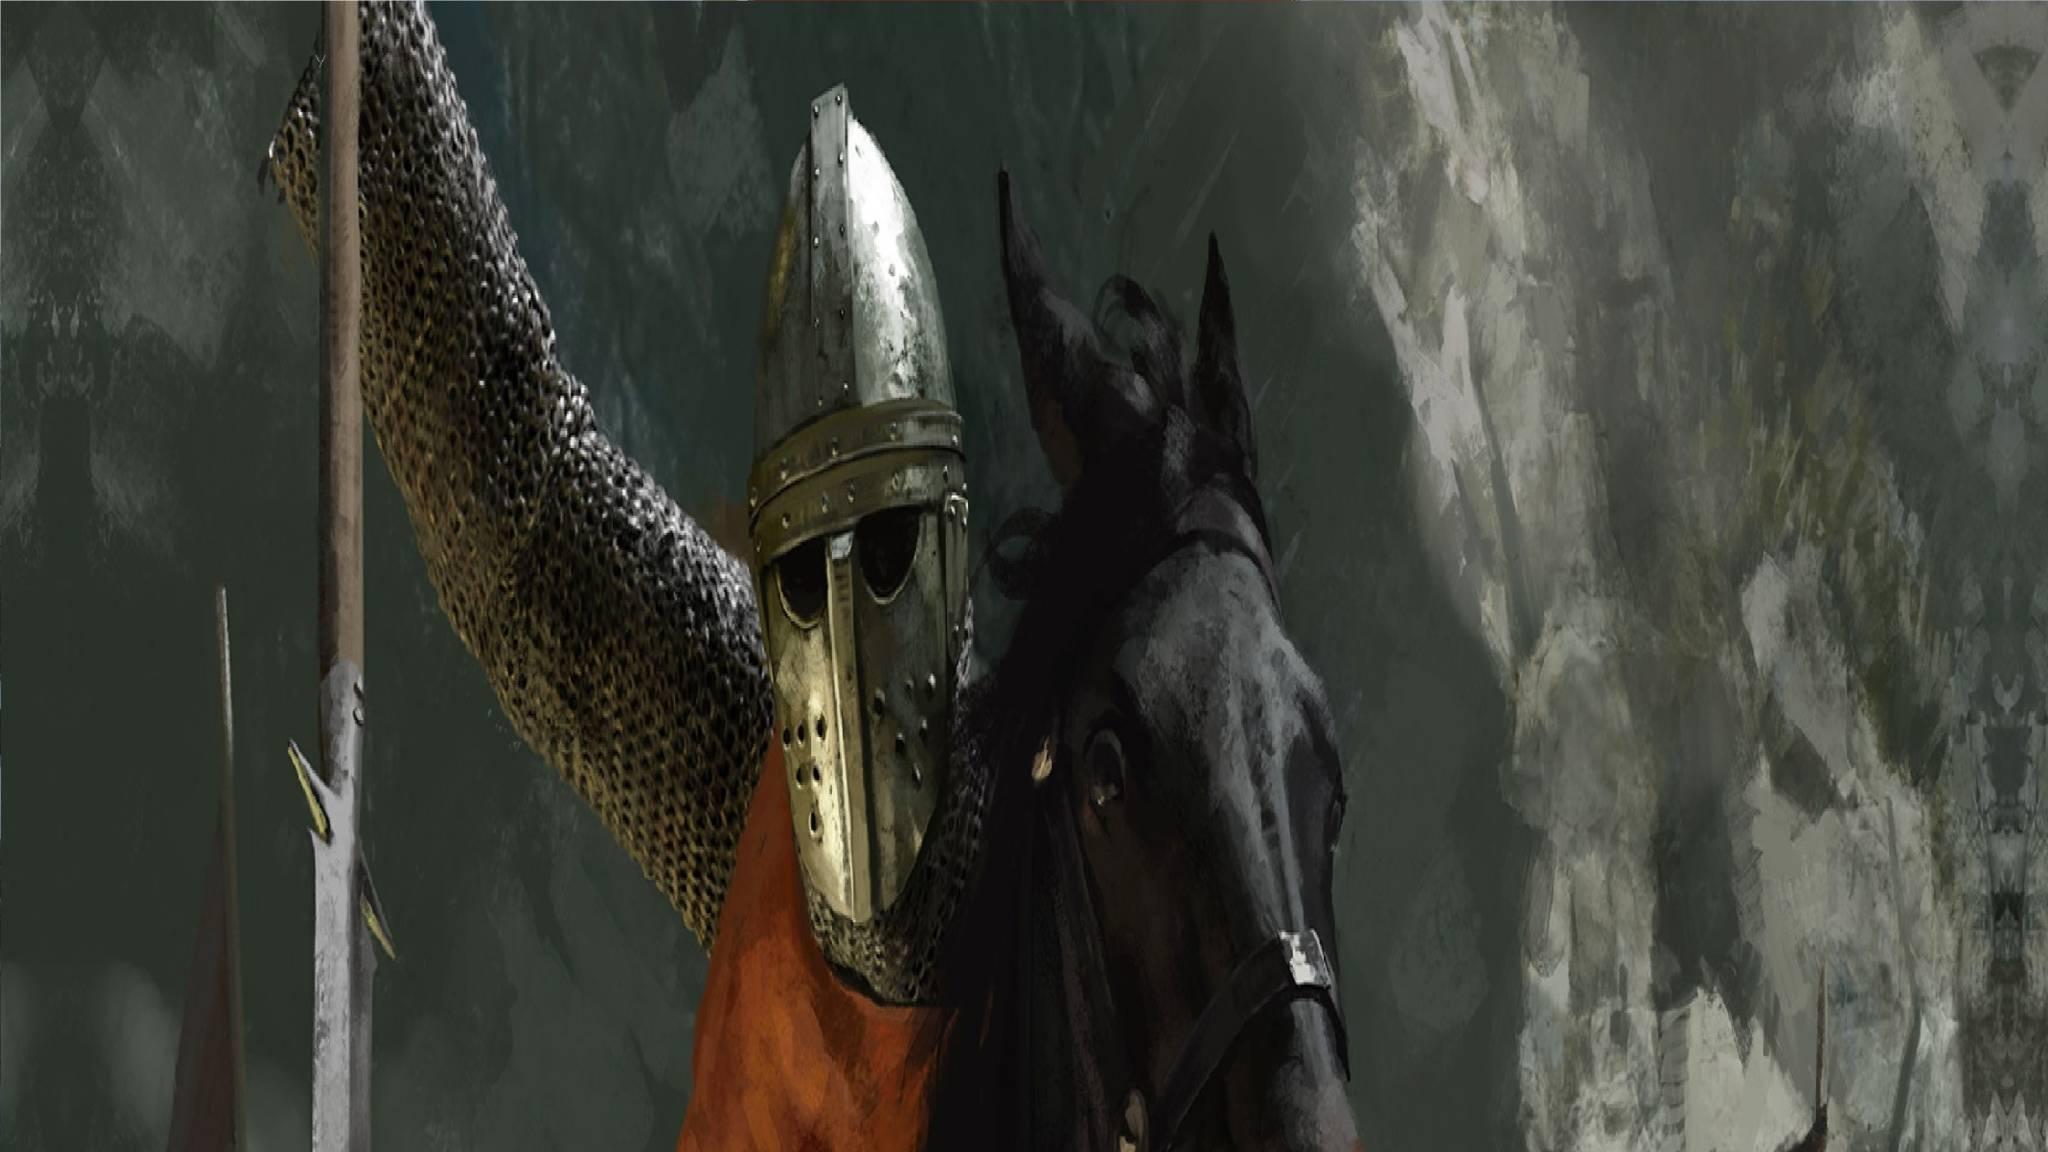 Mount Blade Ii Bannerlord Becoming A Mercenary Or A Vassal